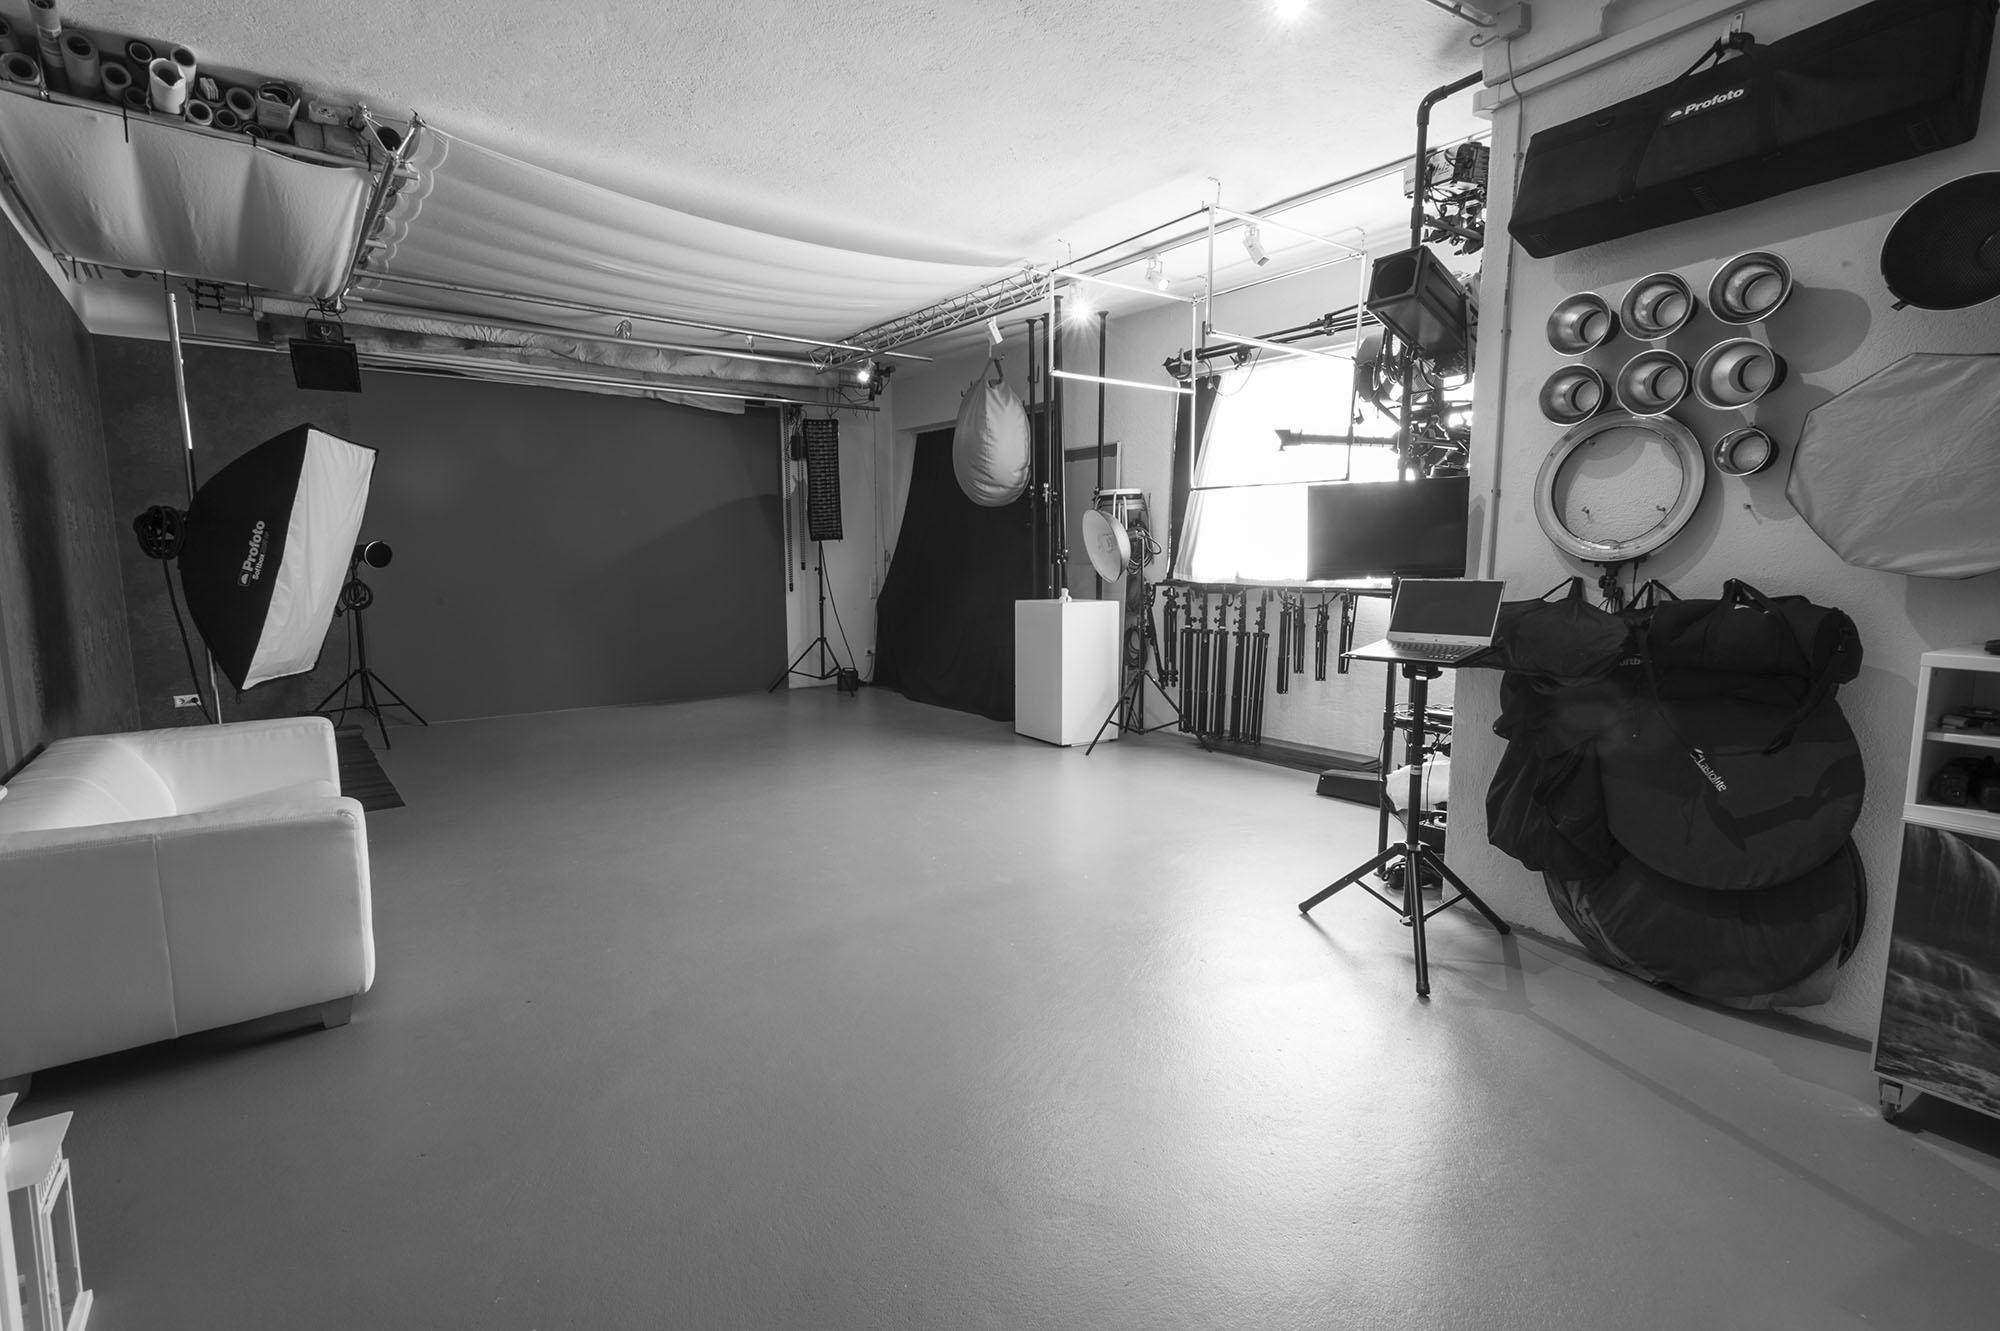 Fotostudio und Mietstudio Studio